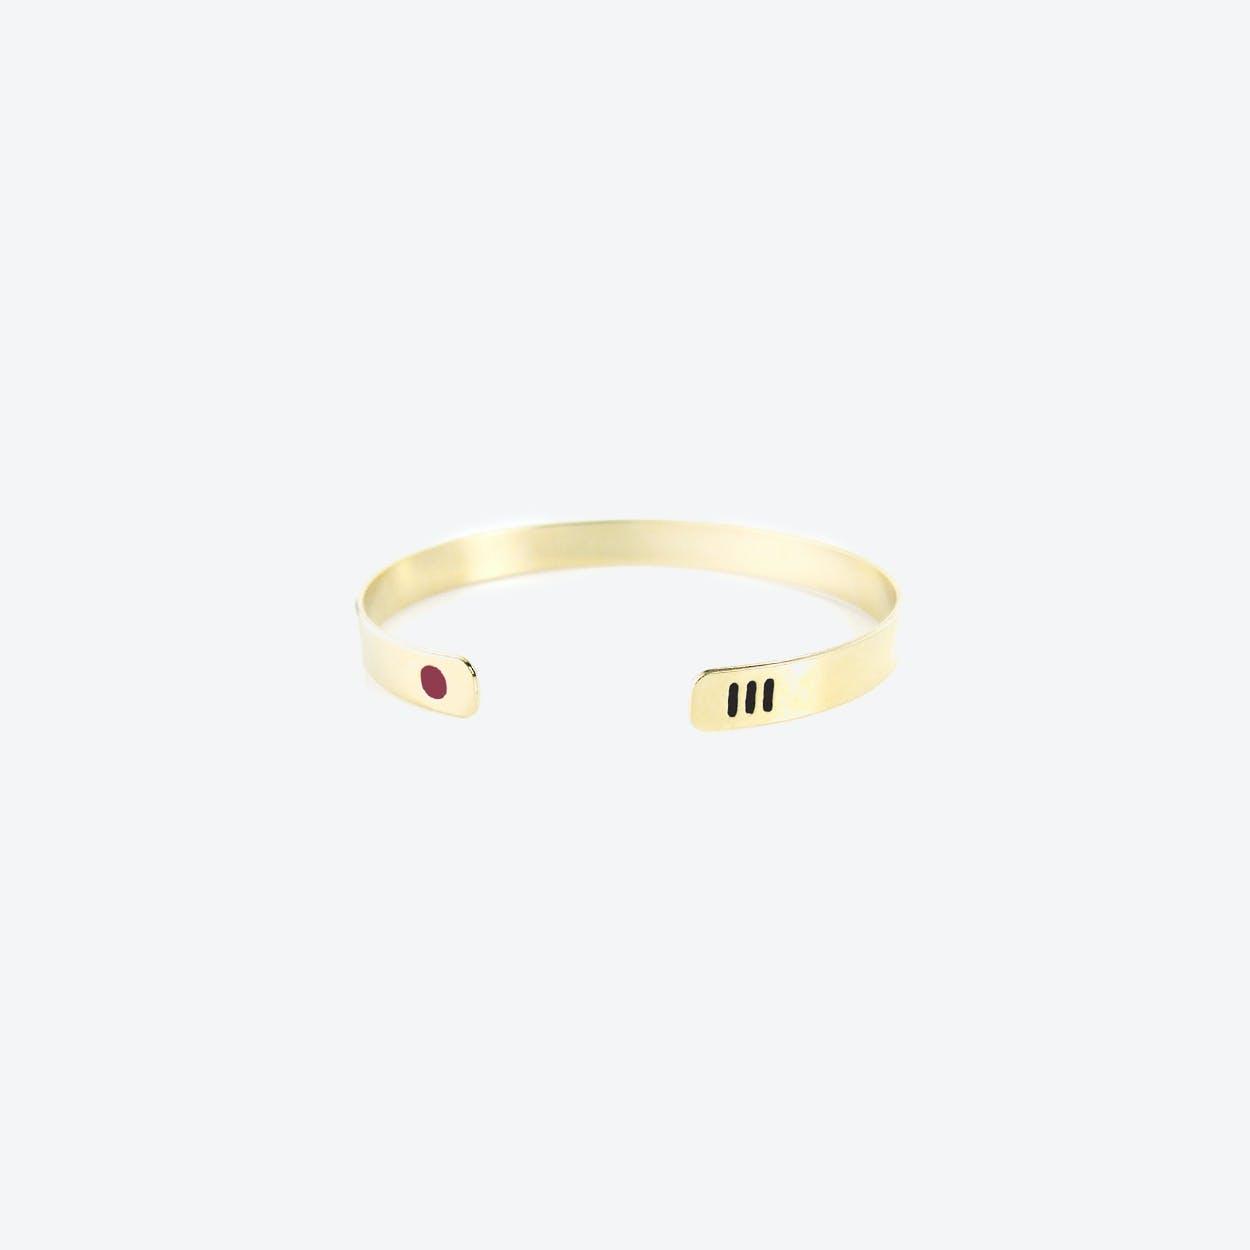 Miami Bracelet - Raspberry & Black